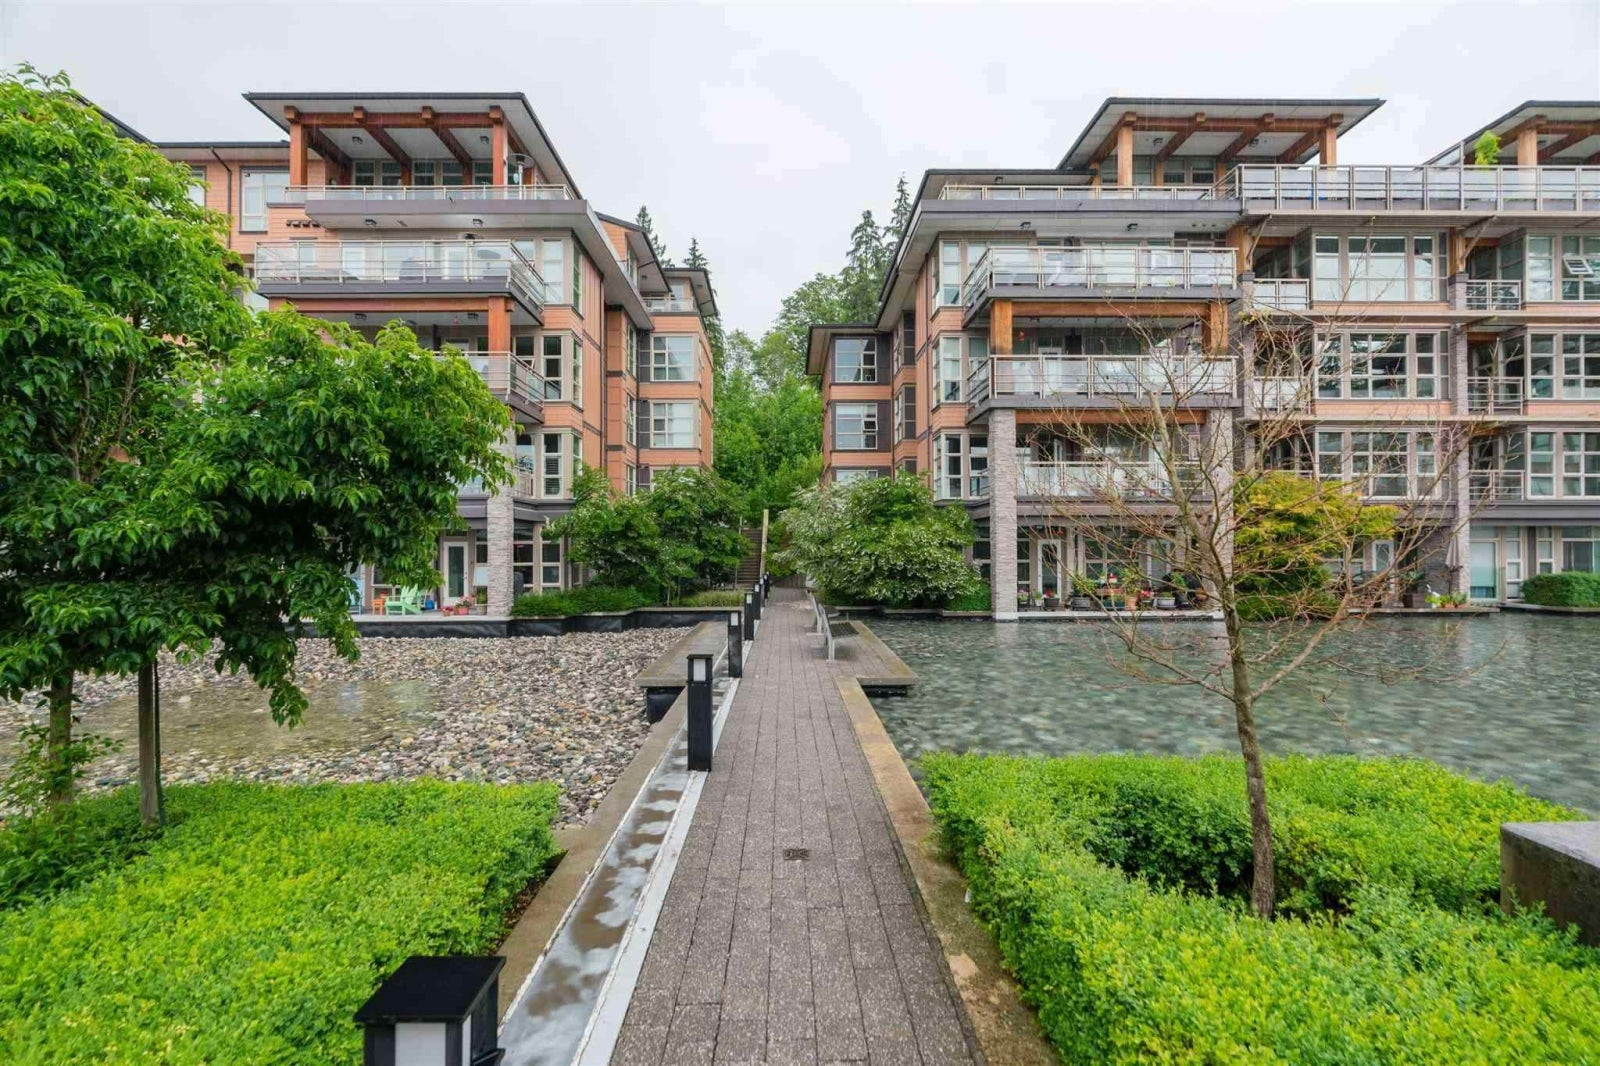 222 3602 ALDERCREST DRIVE - Roche Point Apartment/Condo for sale, 2 Bedrooms (R2603975) #18